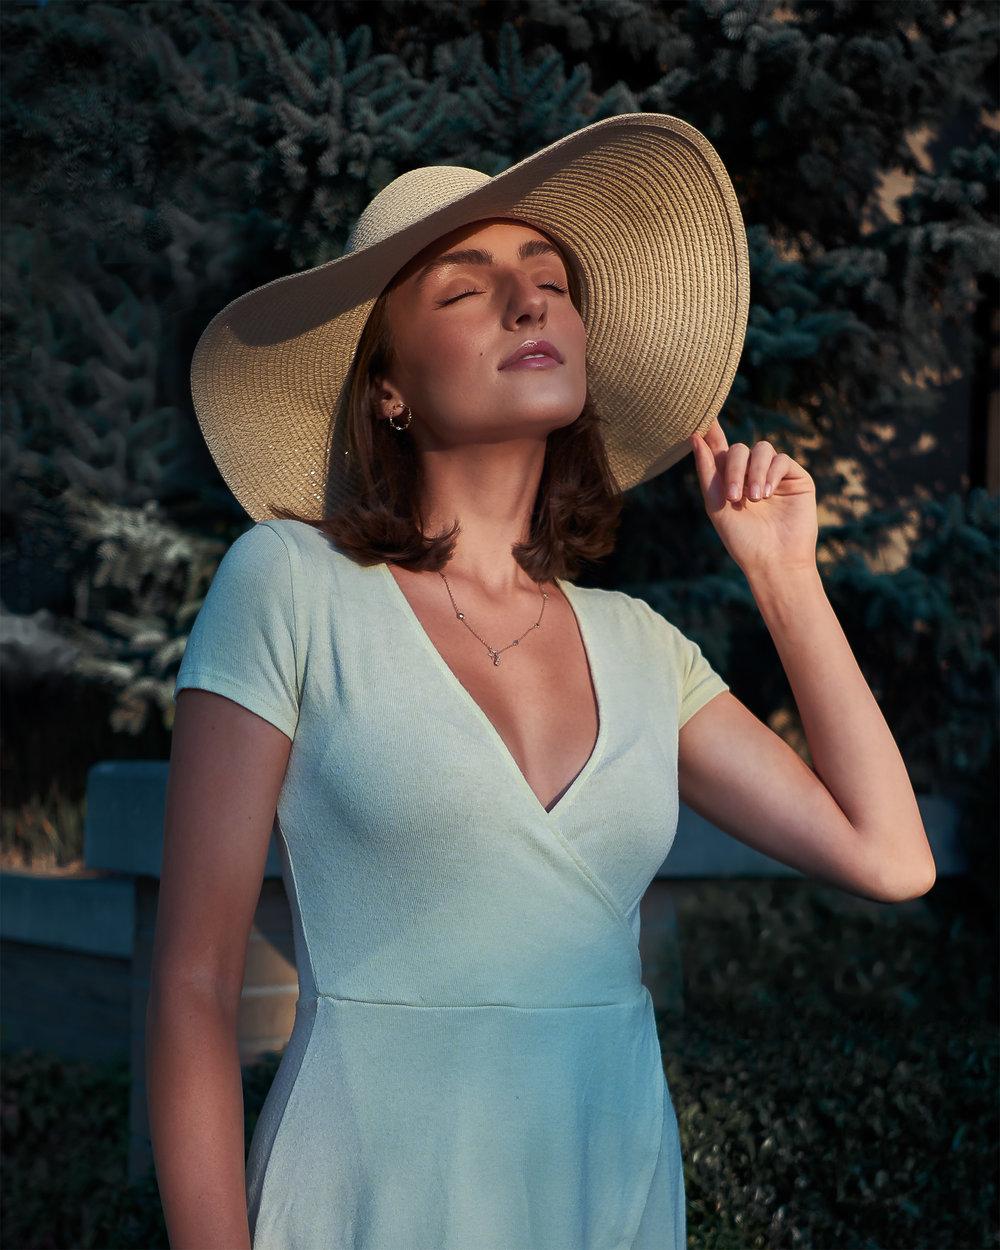 Dress and hat closed eyes.jpg